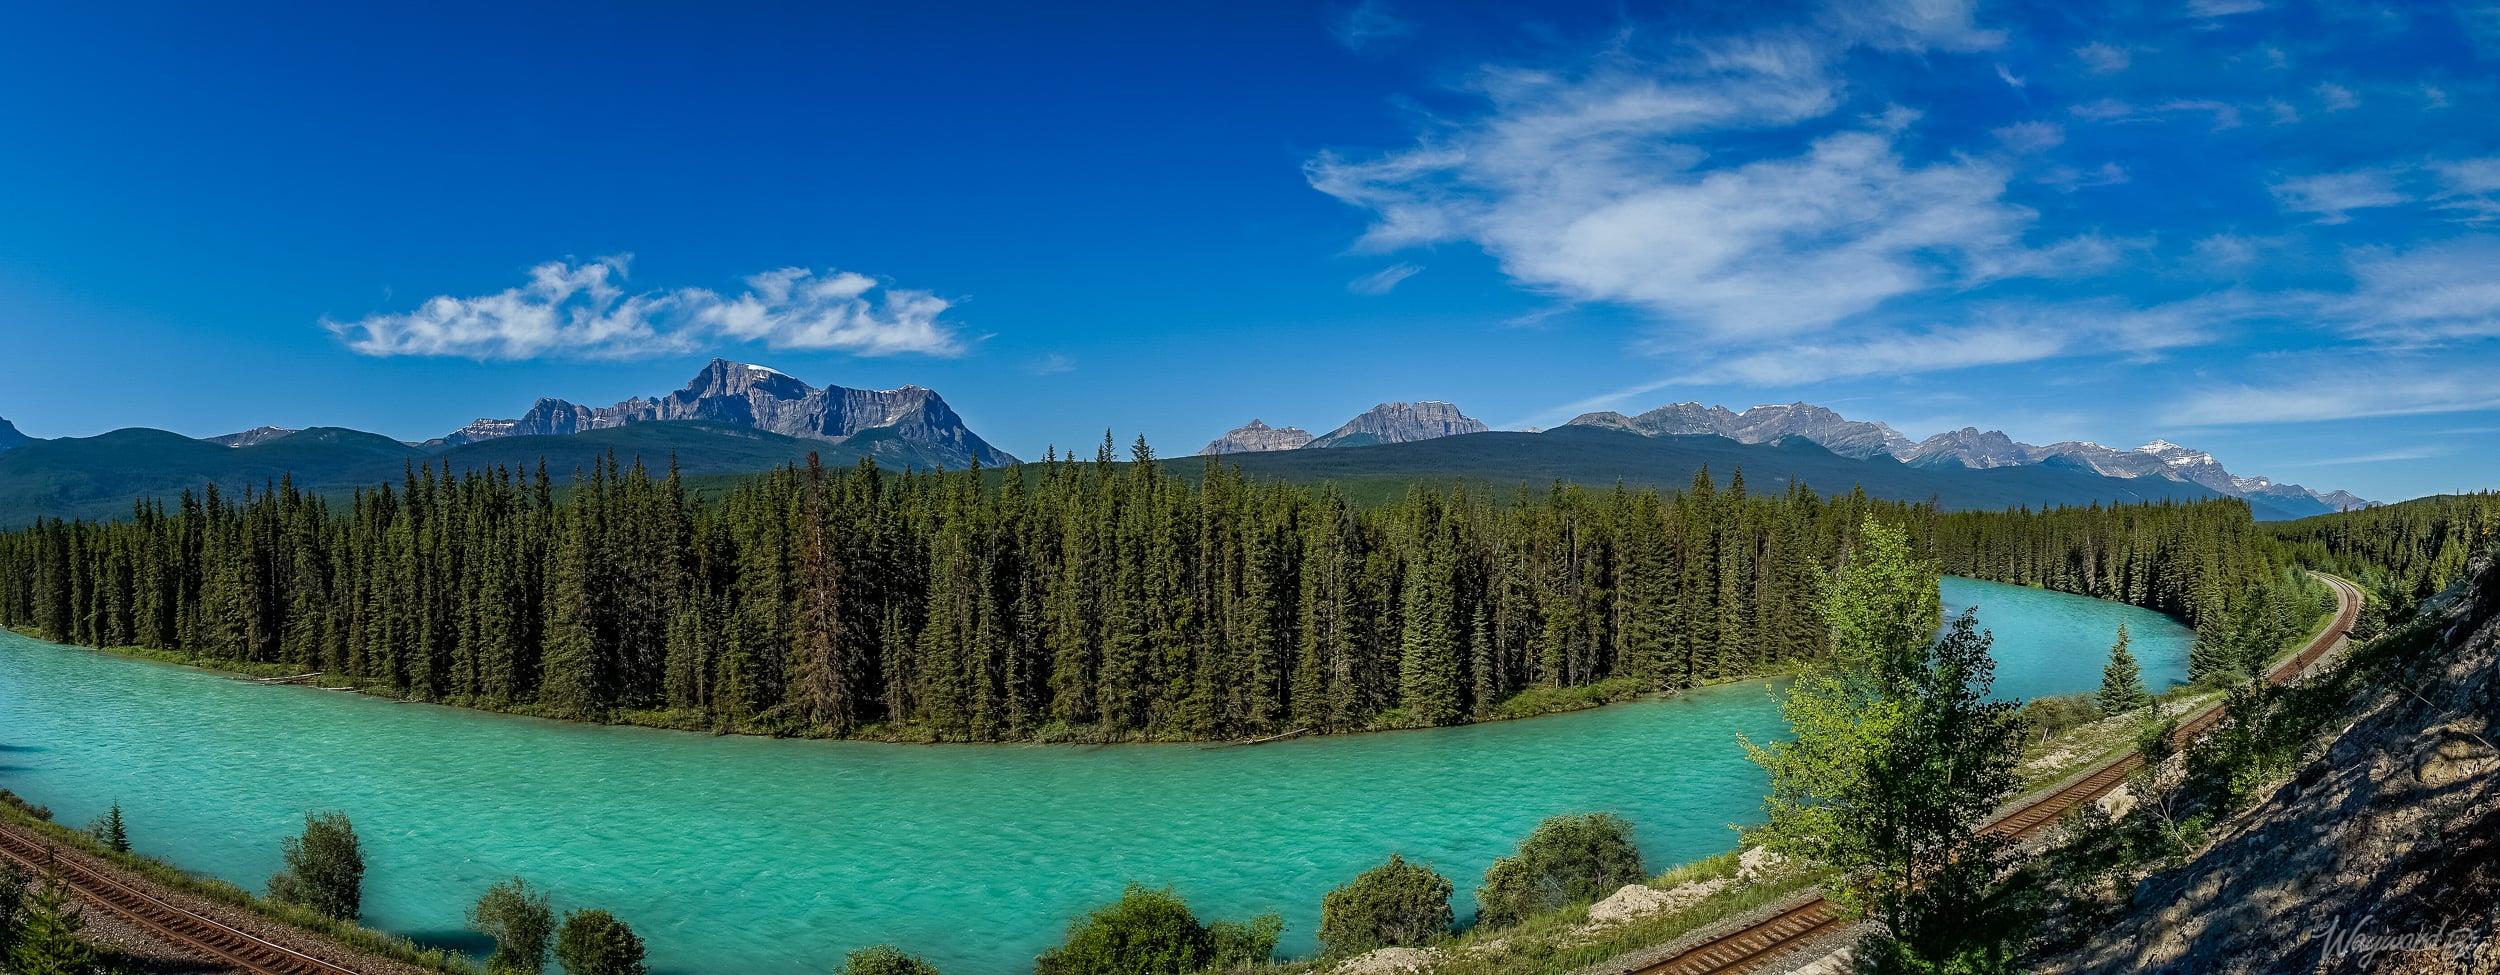 Train Line along Bow River - The Wayward Post - Photo Story - Banff National Park.